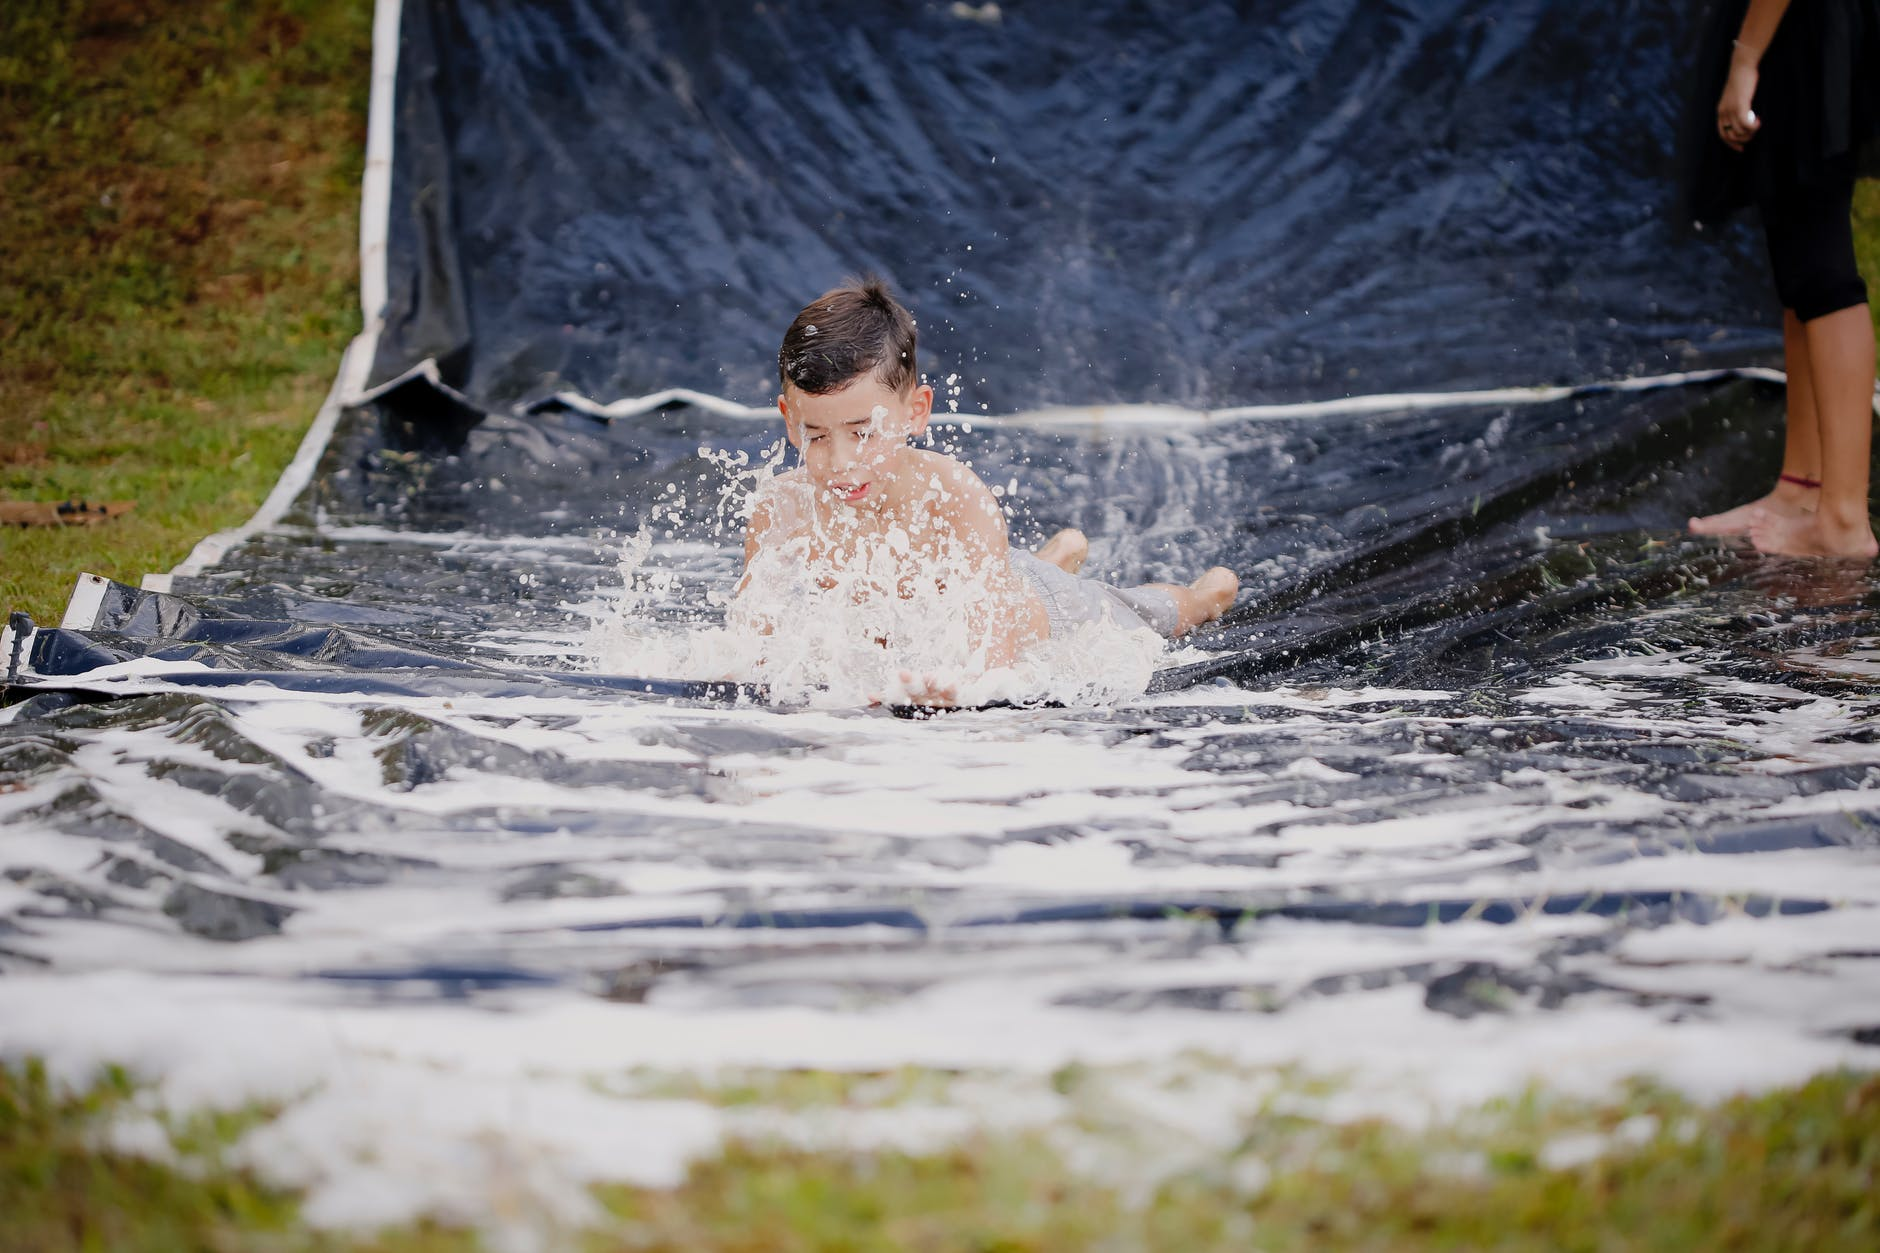 slip and slide, backyard upgrade, thelashop